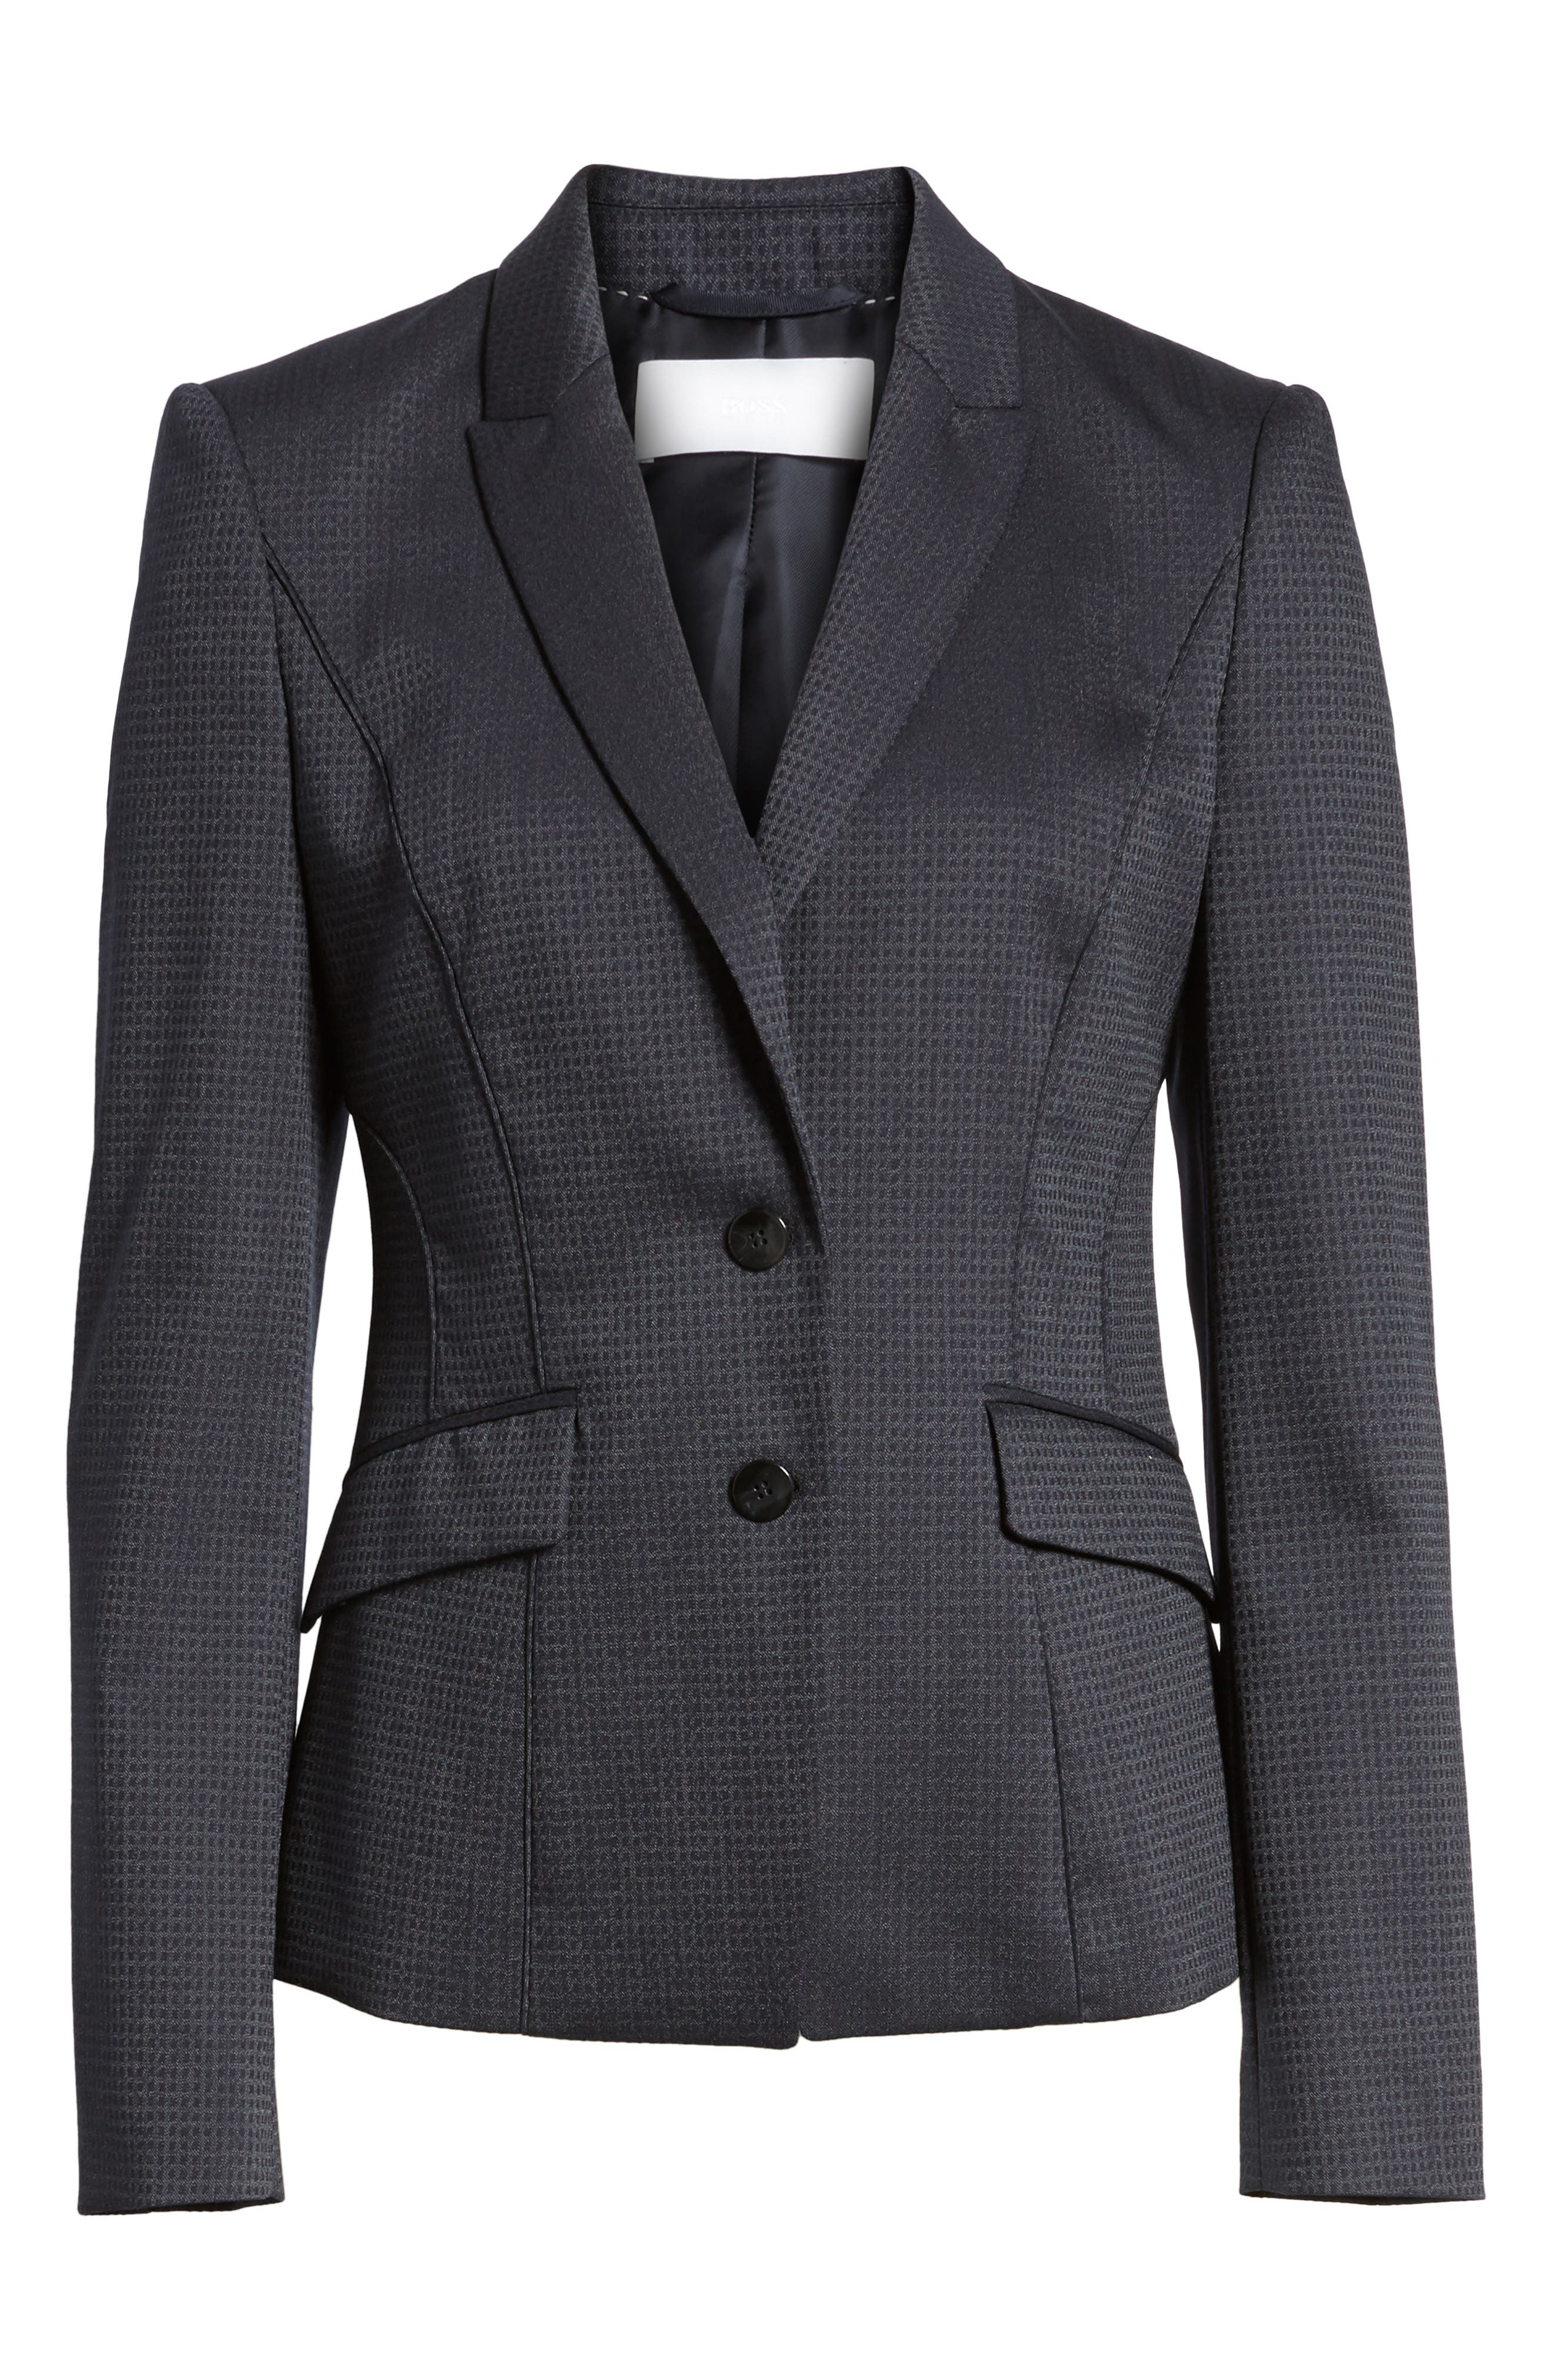 Jukani Check Wool Blend Suit Jacket,                         Main,                         color, Grey